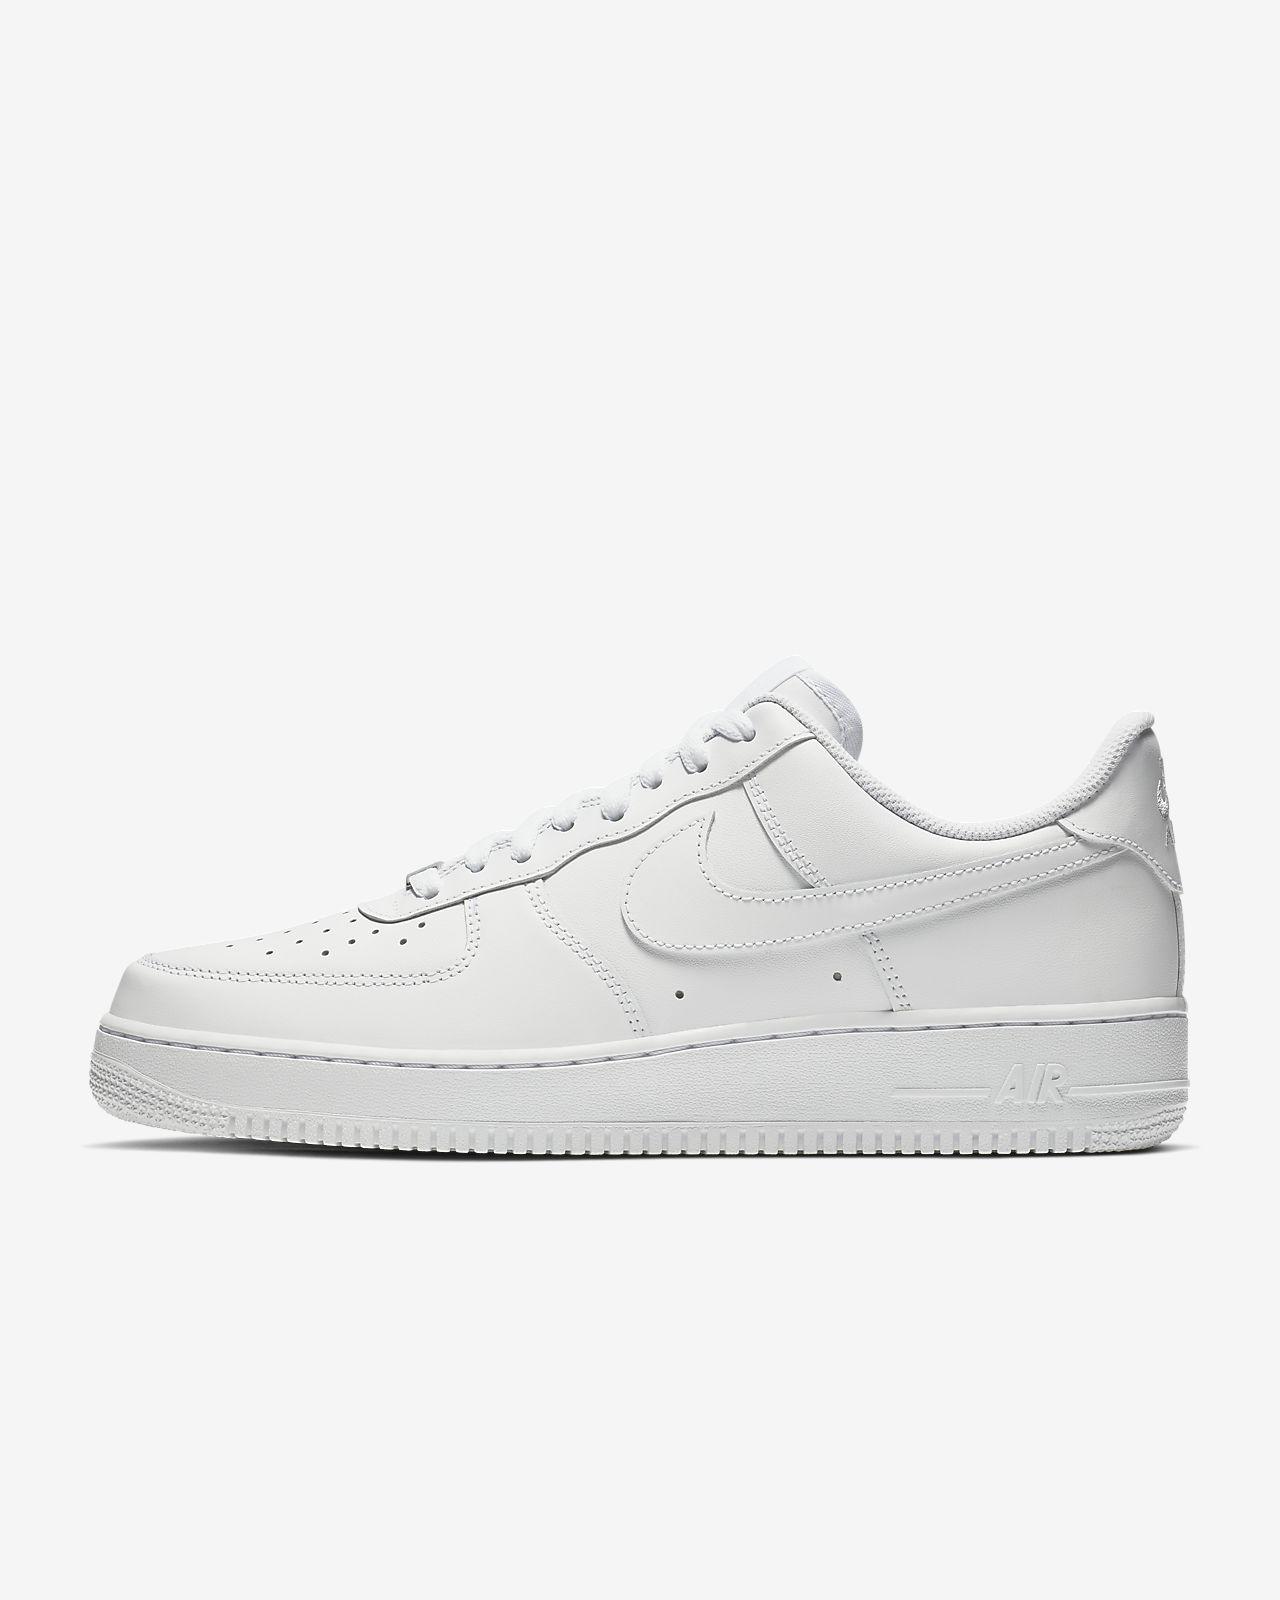 Nike Air Force 1 '07 Zapatillas - Hombre